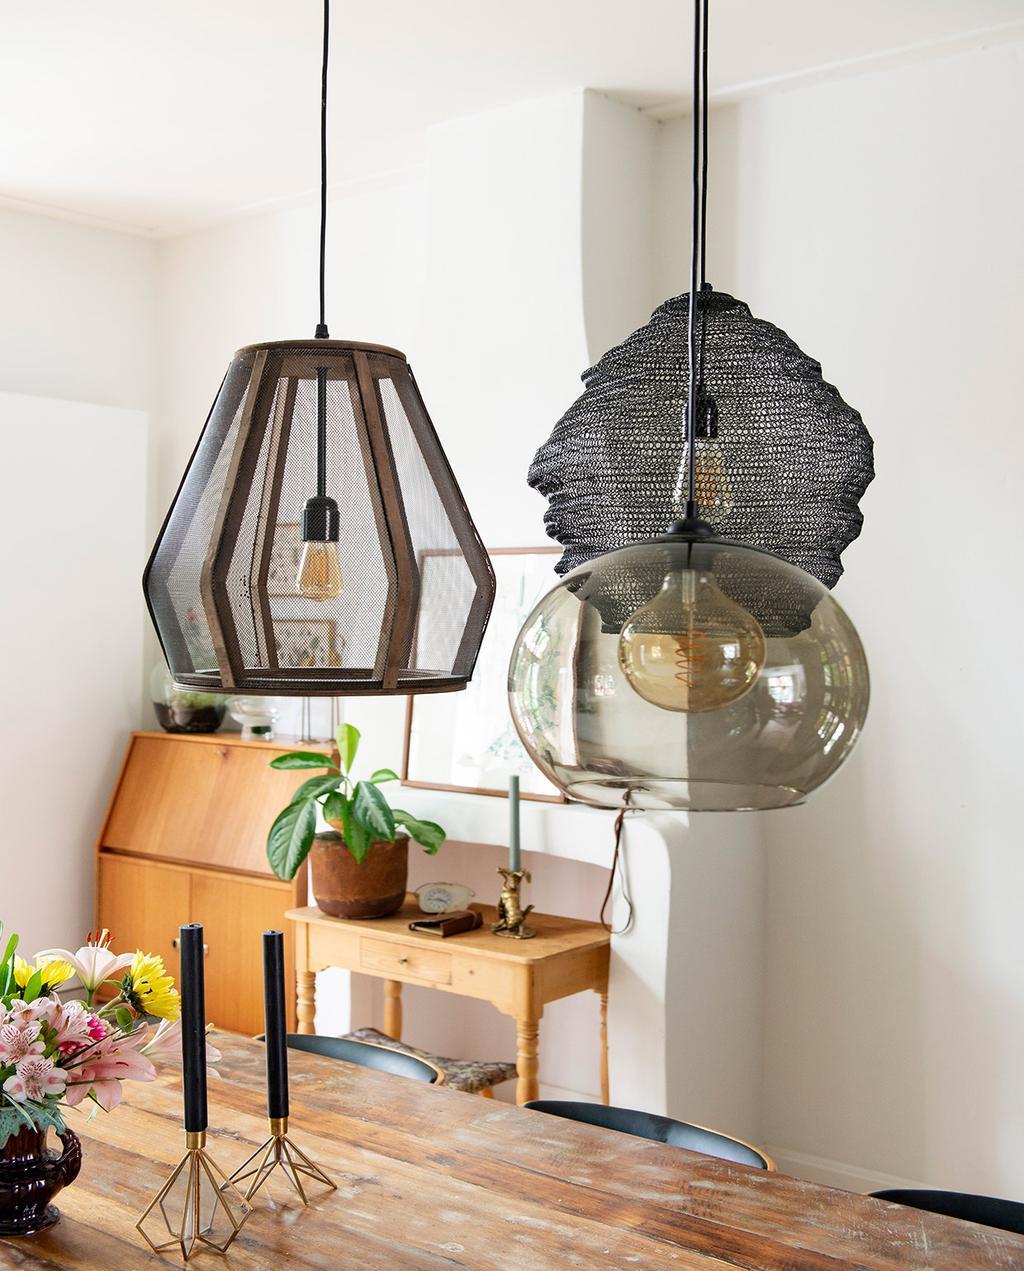 vtwonen 01-2021 | verschillende hanglampen boven eettafel